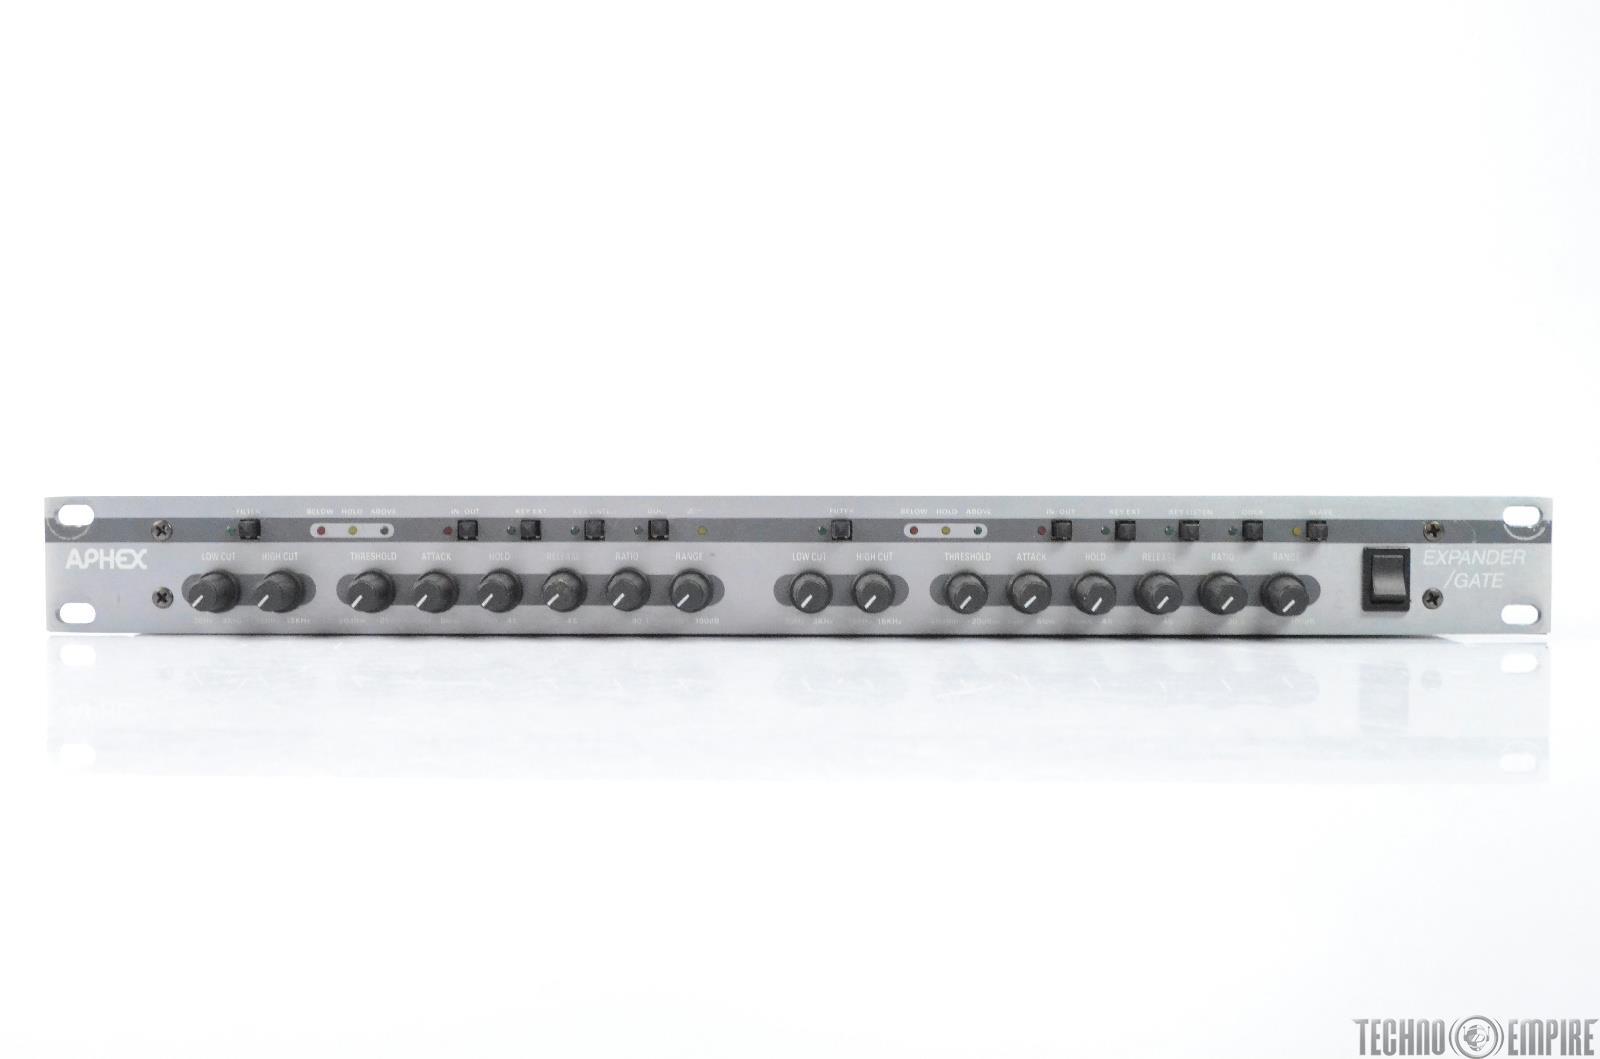 Aphex 612 Dual Channel Expander Gate Grandmaster Recorders #28716